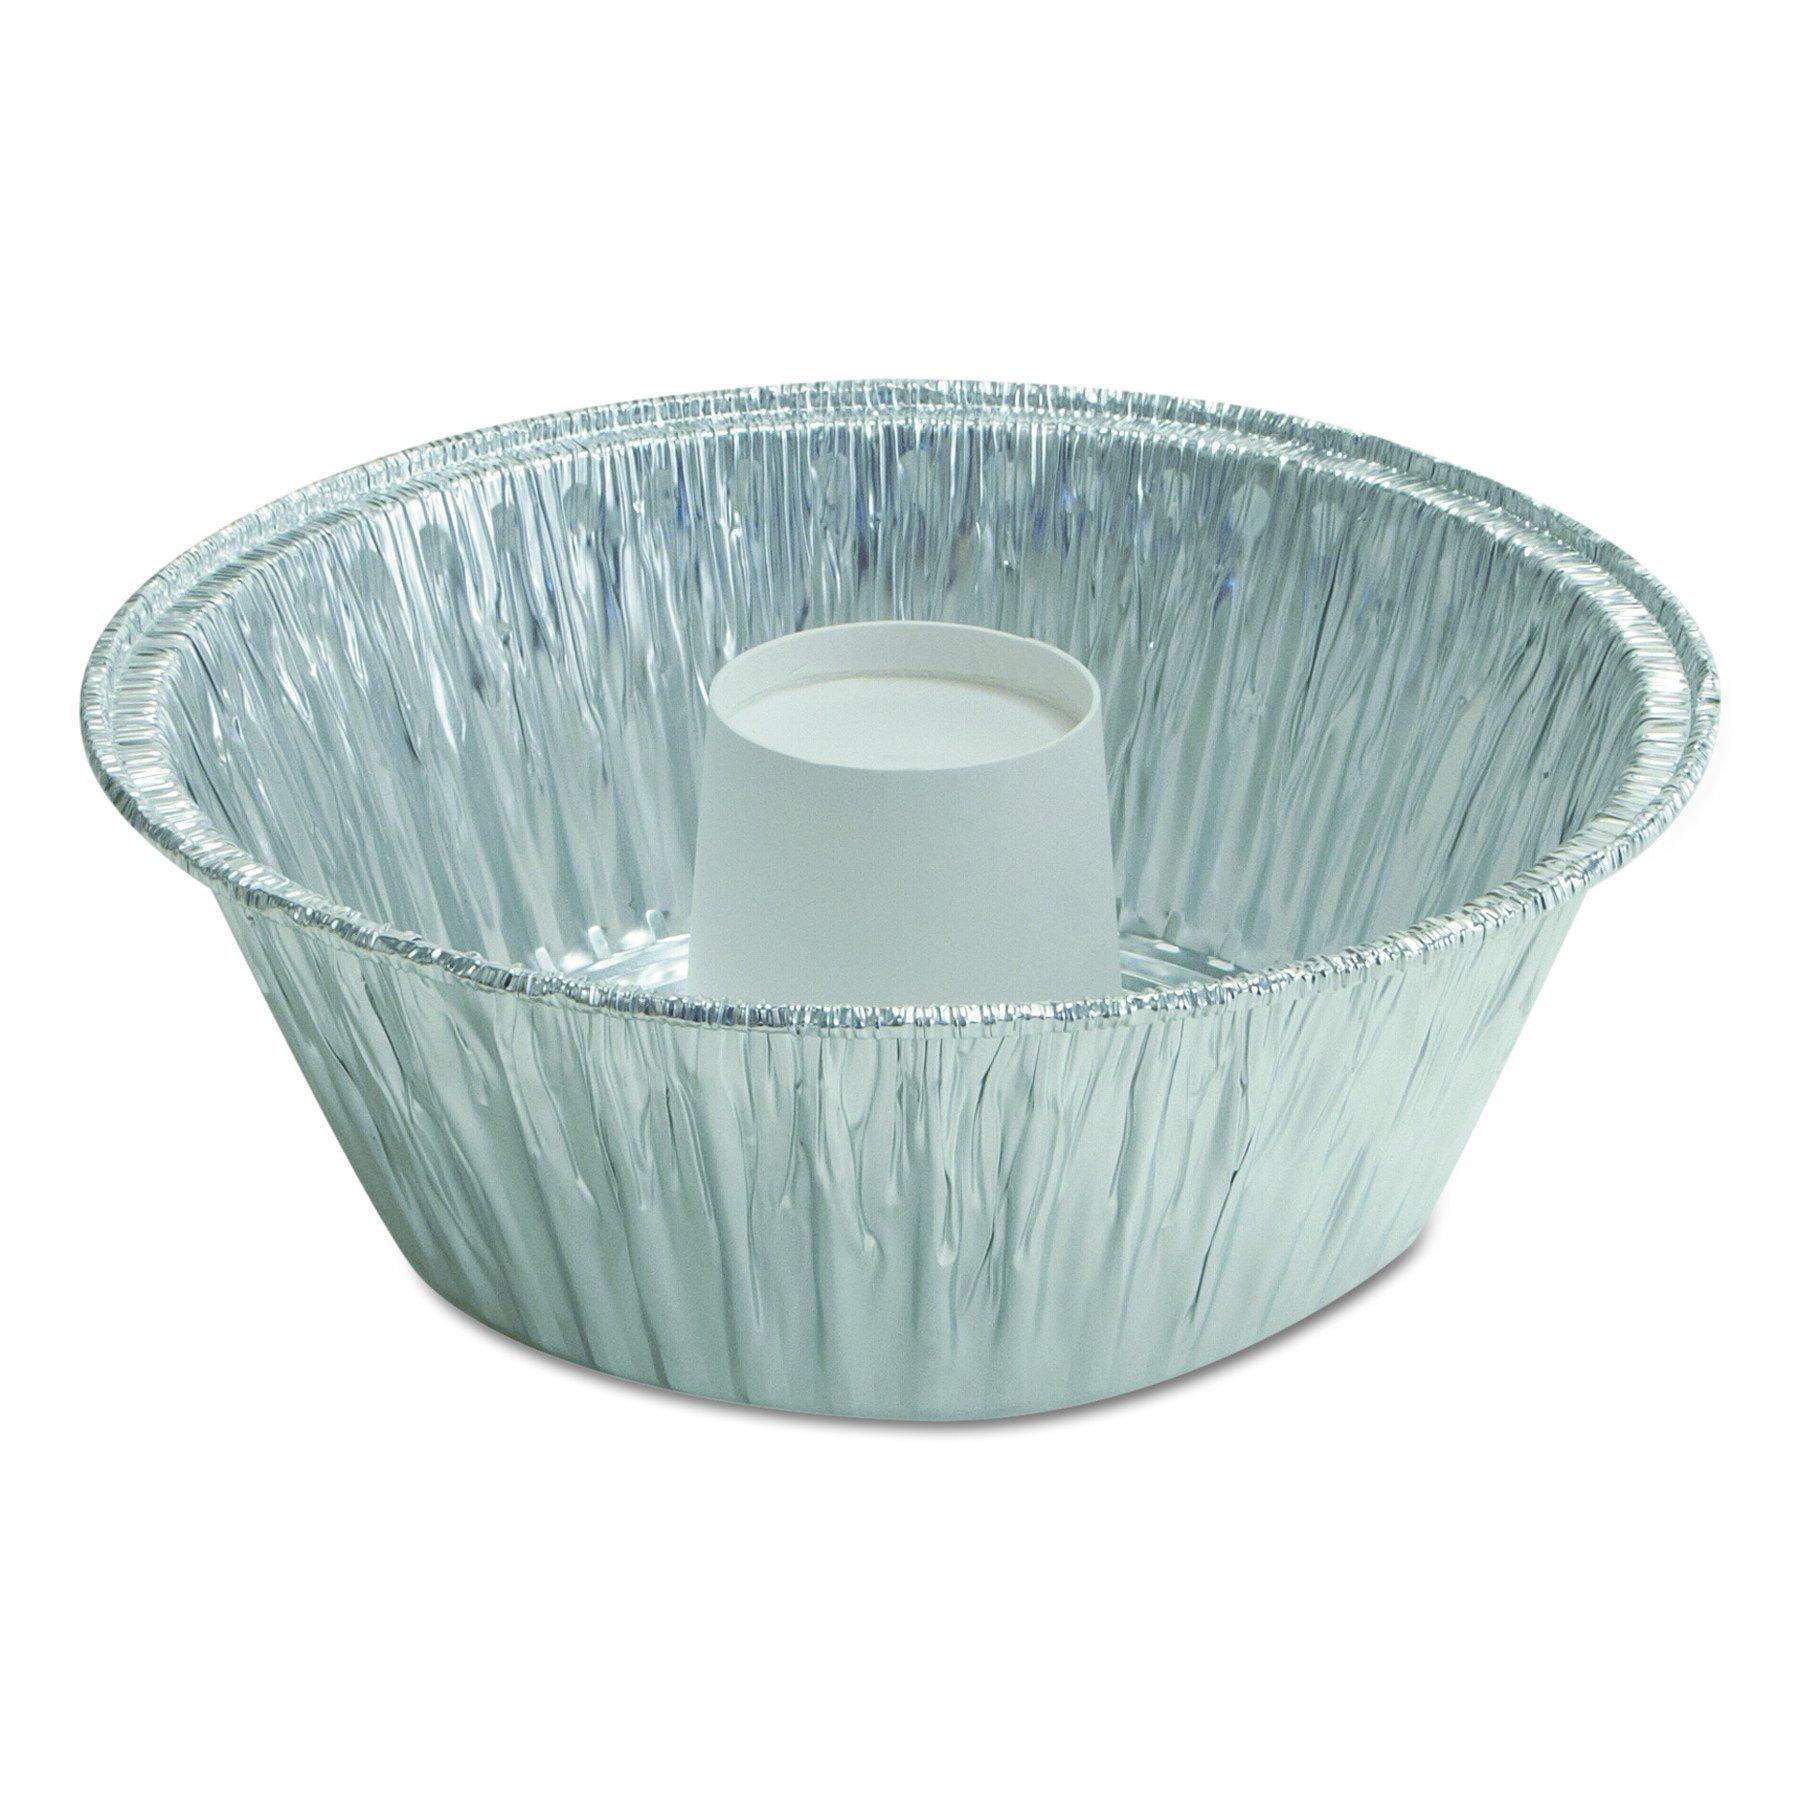 Handi-Foil of America 406035 Angel Food Cake Pan, 60 oz, 8 3/4'' x 3 5/32'' (Case of 250)